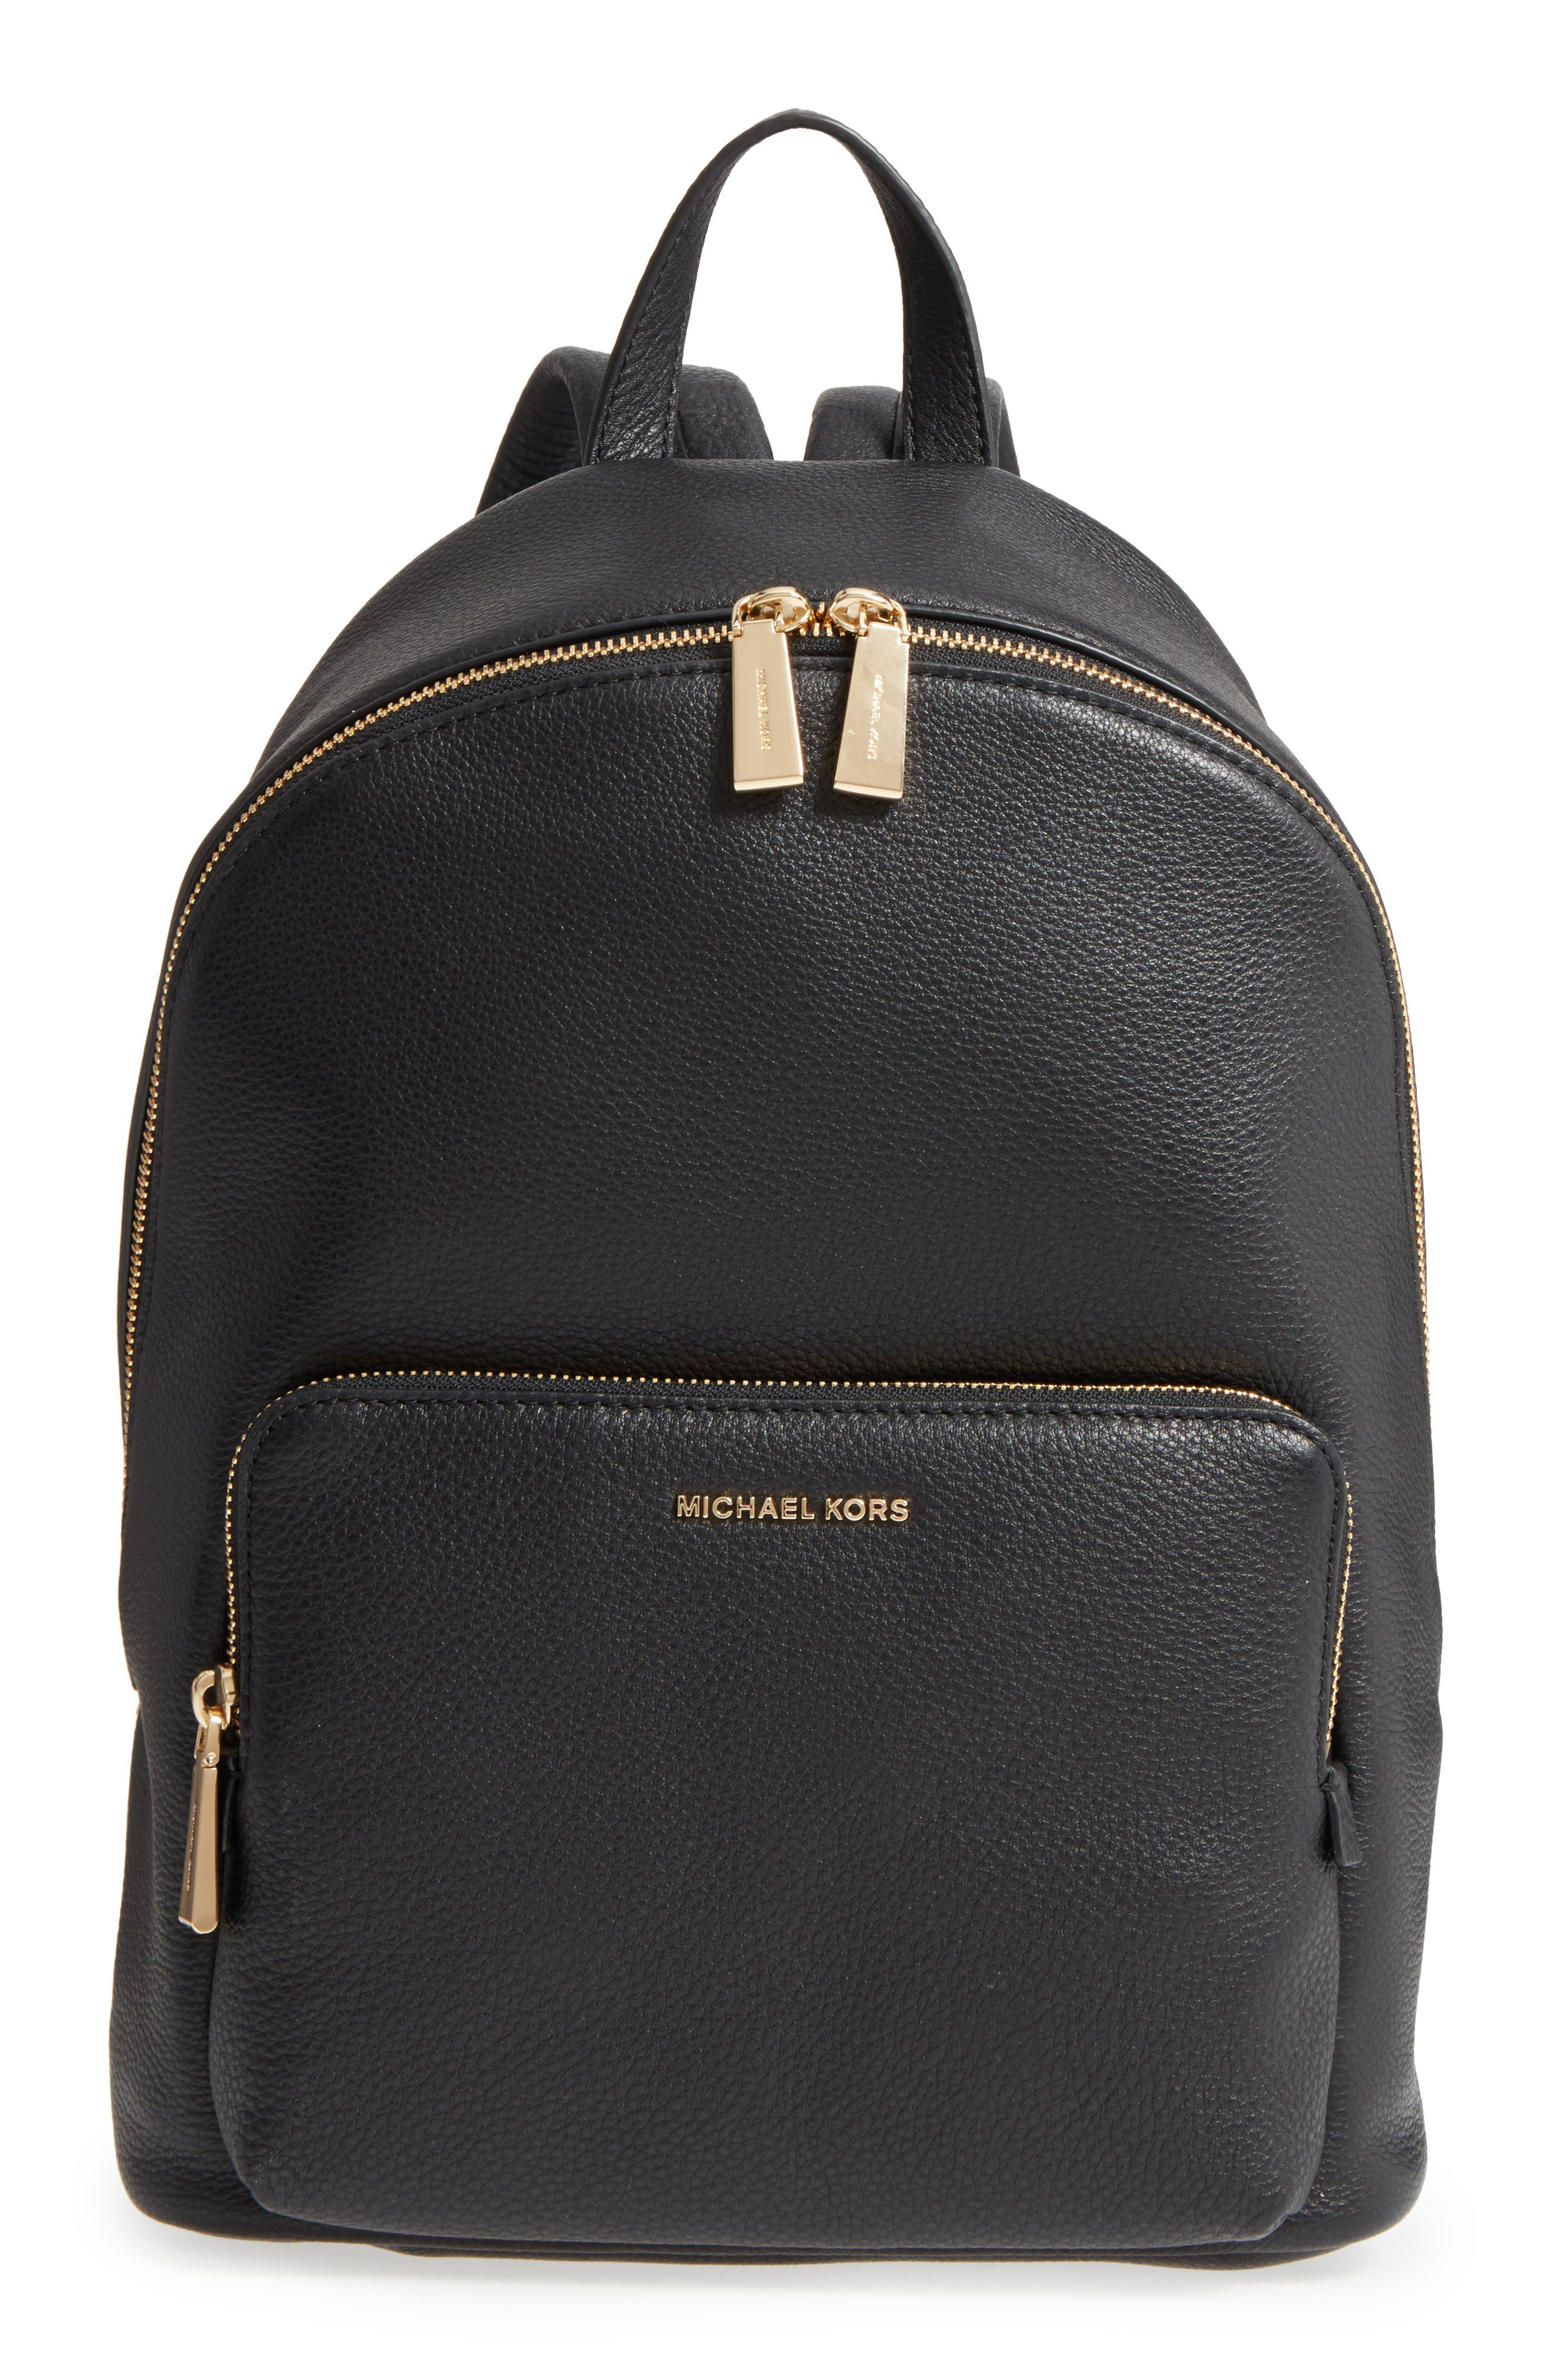 Michael Kors Large Wythe Leather Backpack